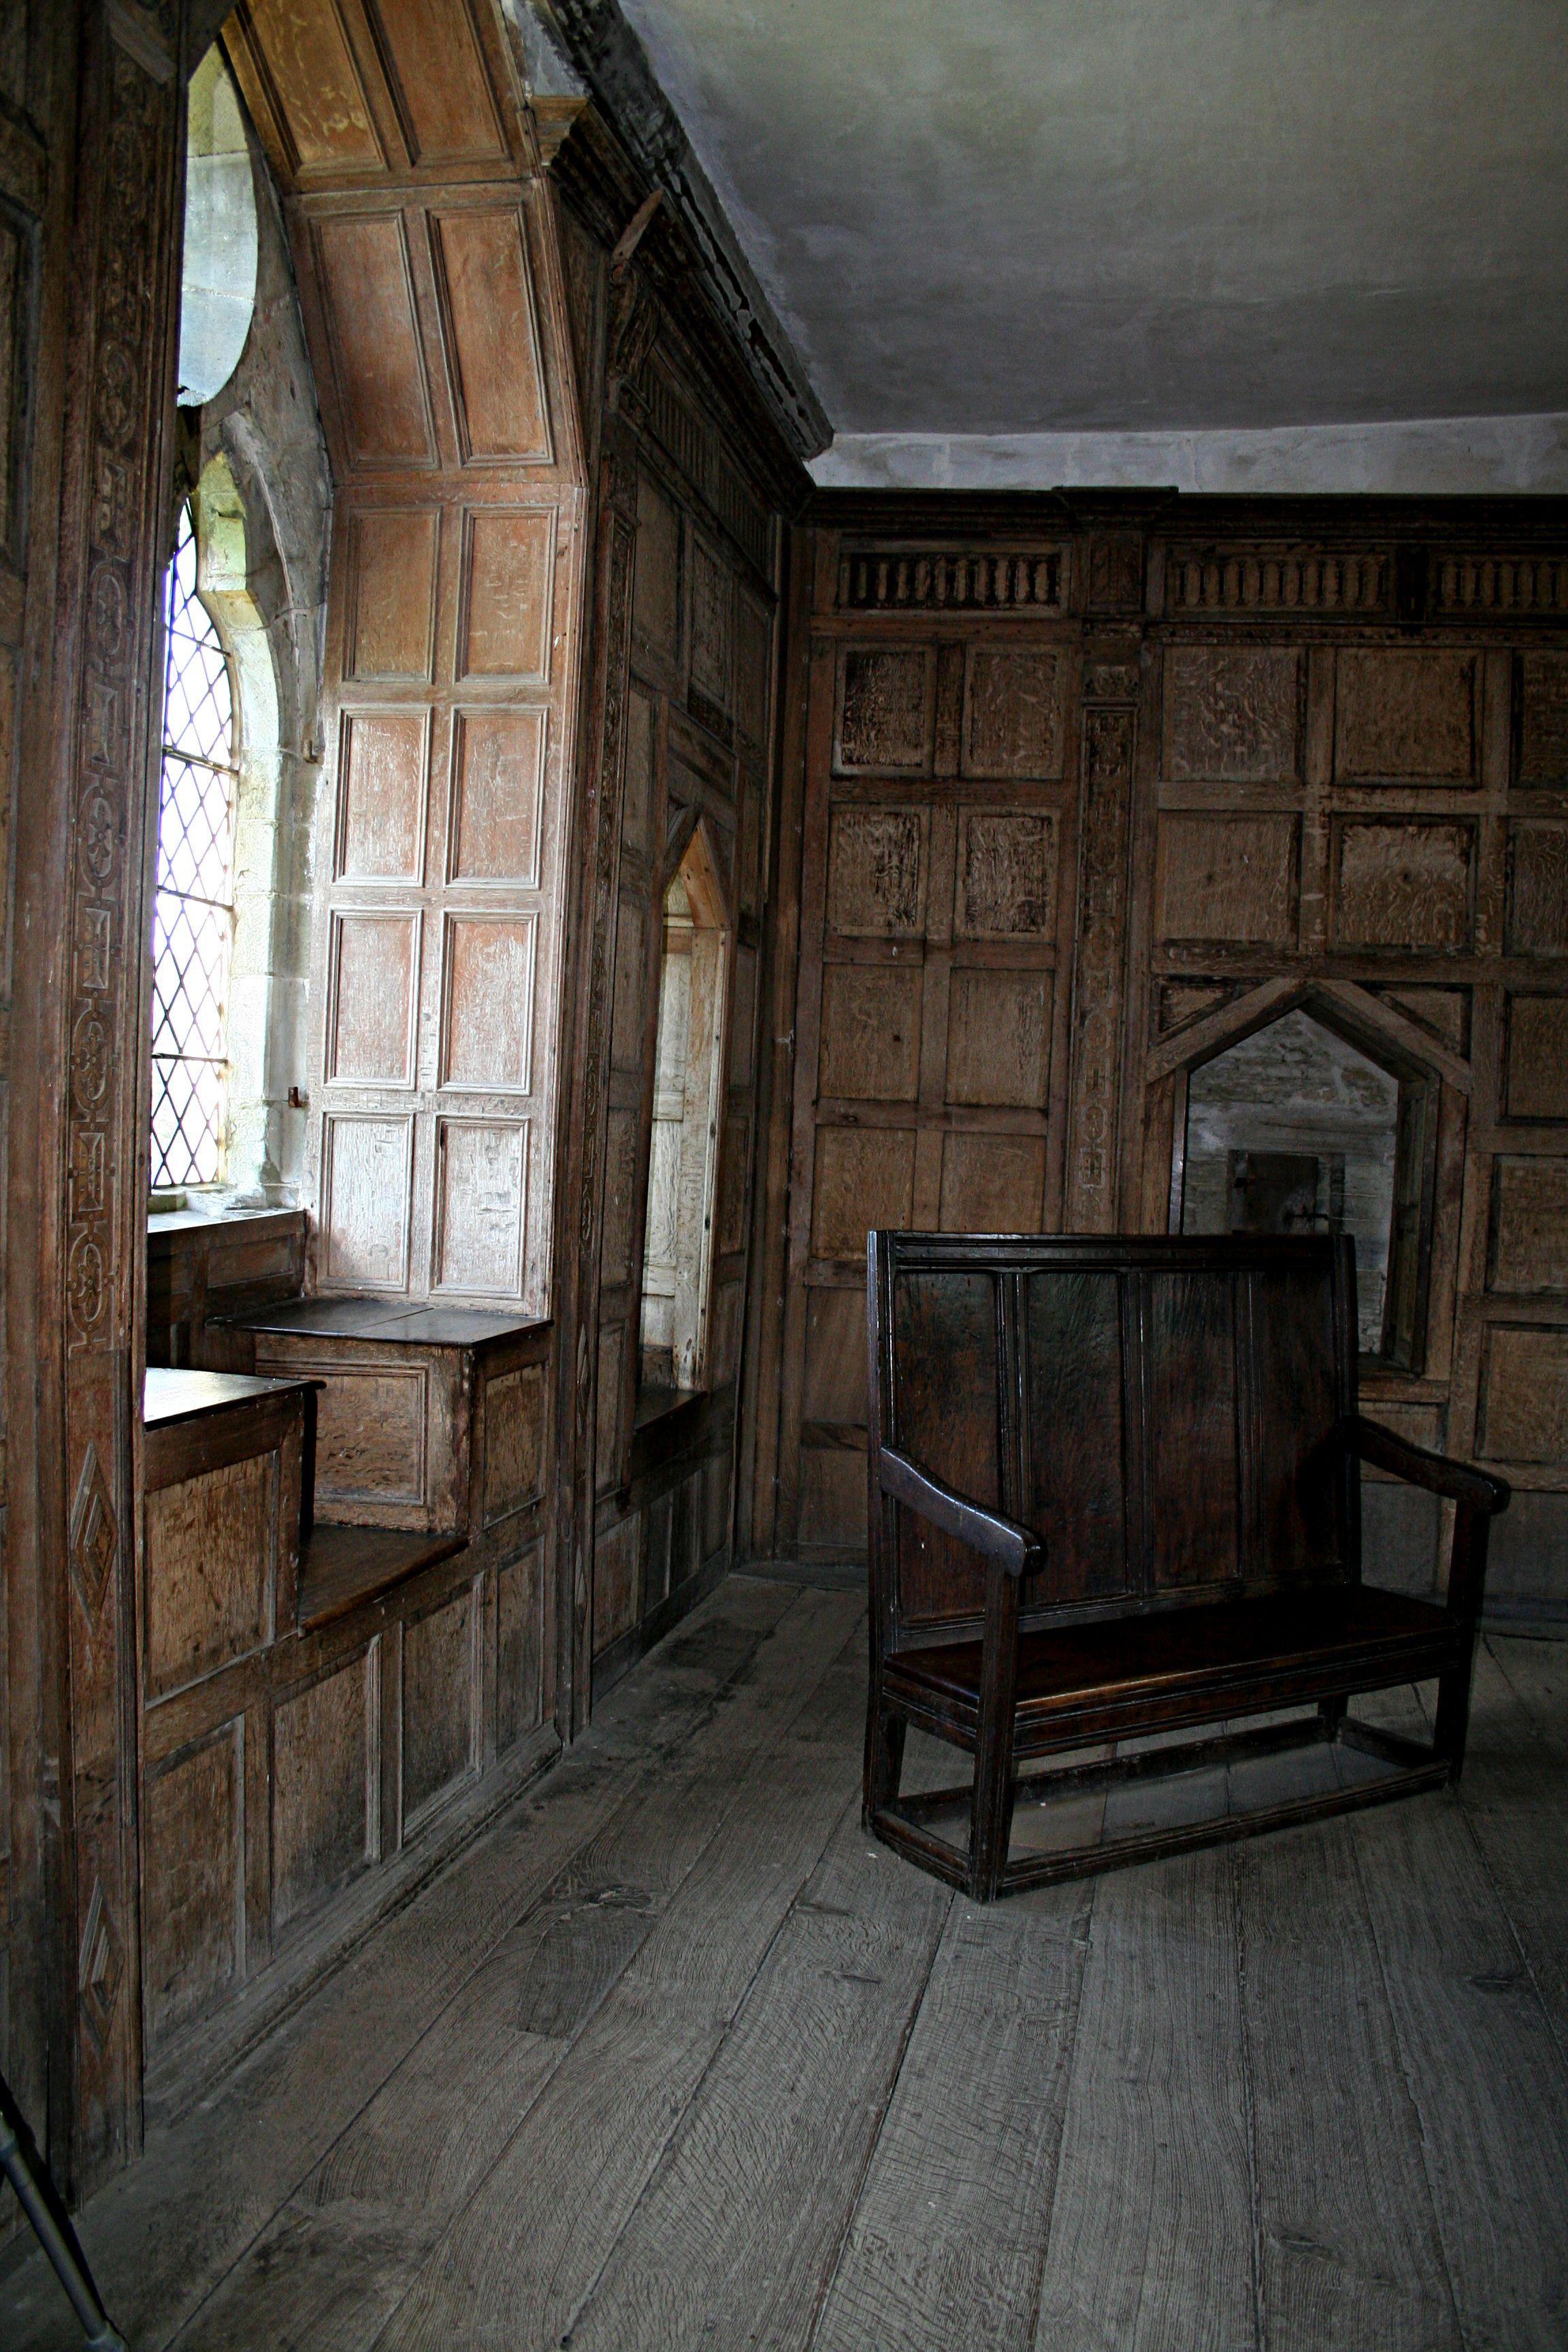 stokesay castle interior 17gothicbohemianstock   brown